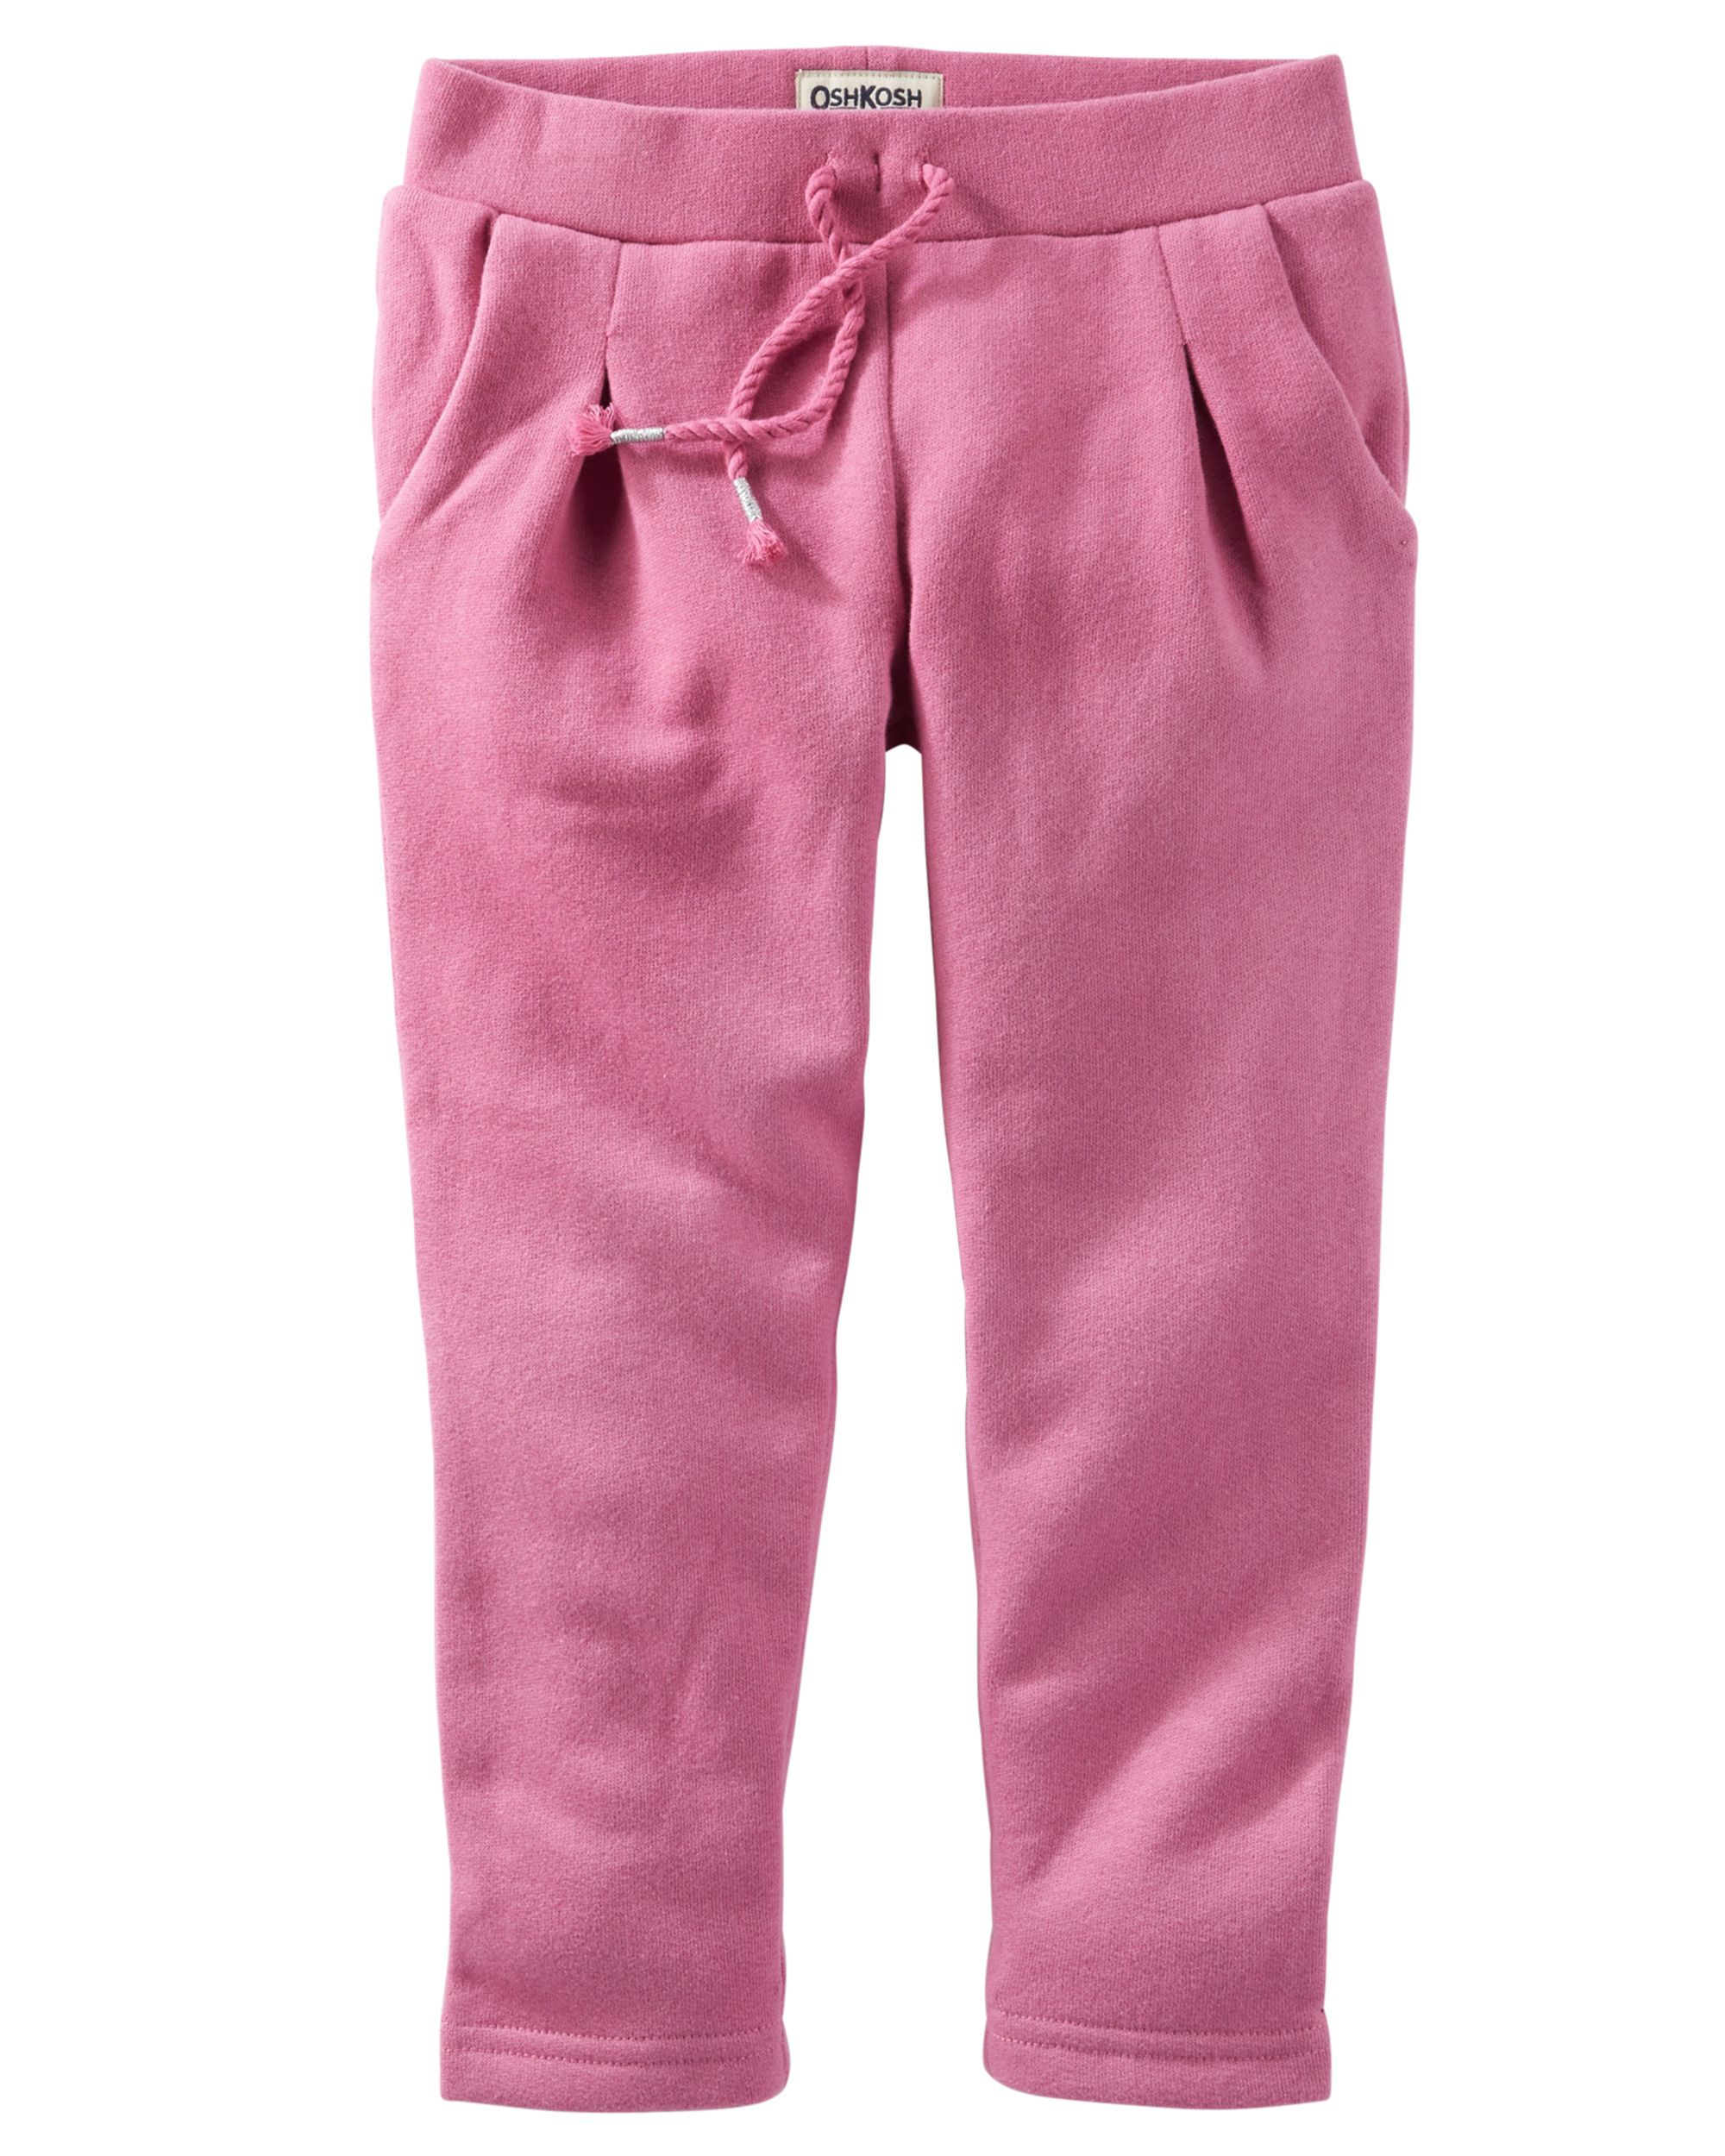 Baby Girl French Terry Pants from OshKosh B gosh Shop clothing